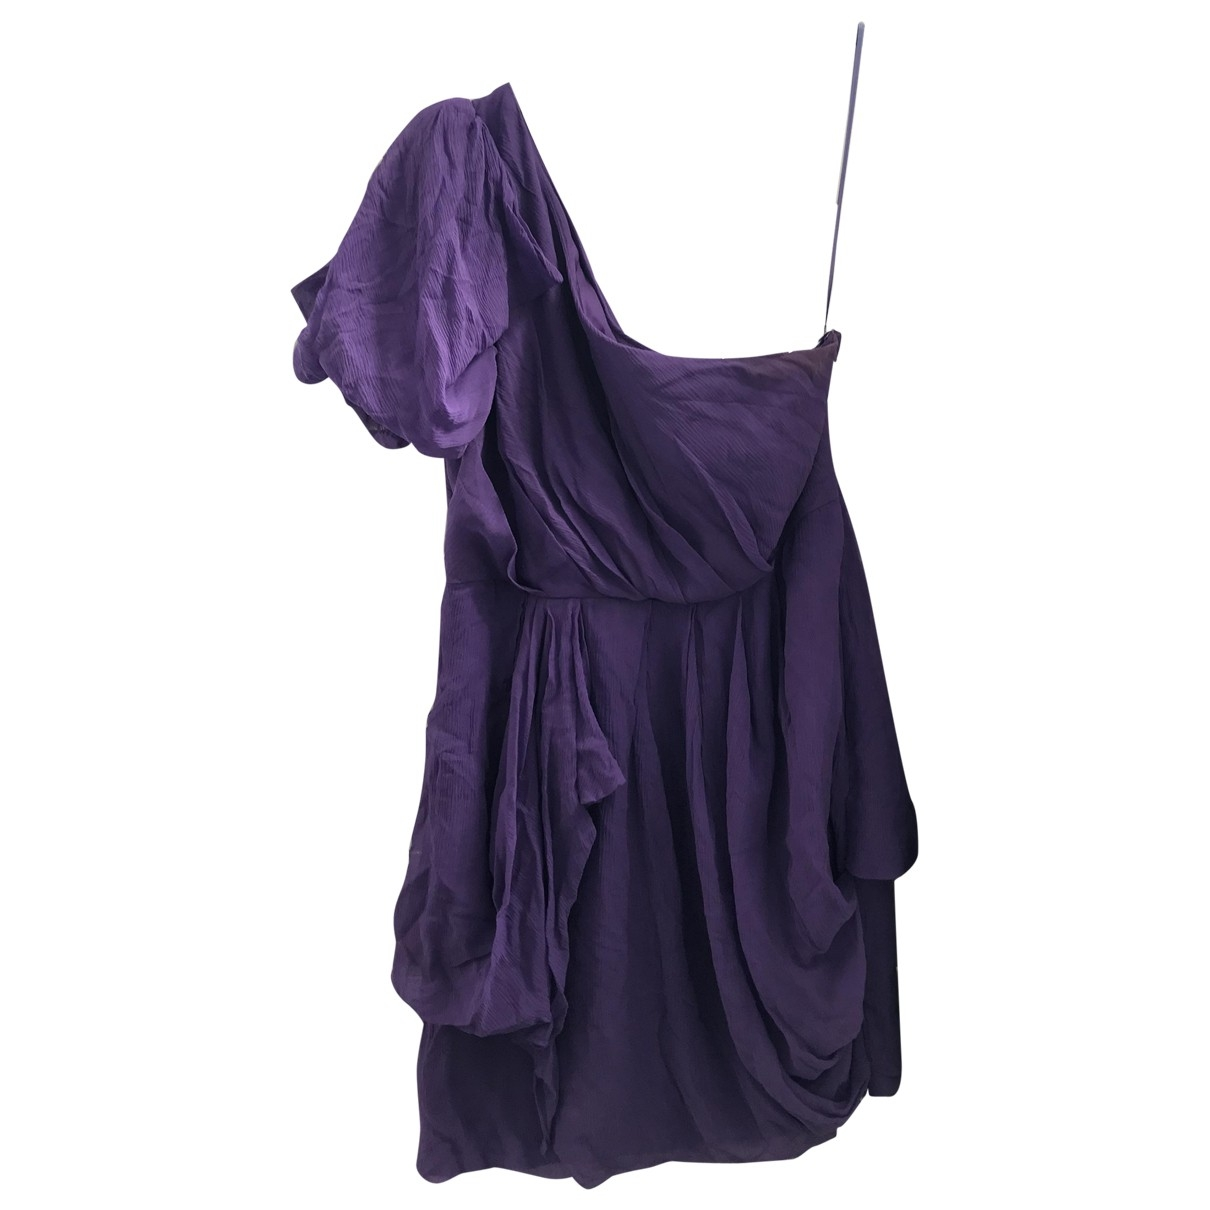 Tibi \N Kleid in  Lila Seide